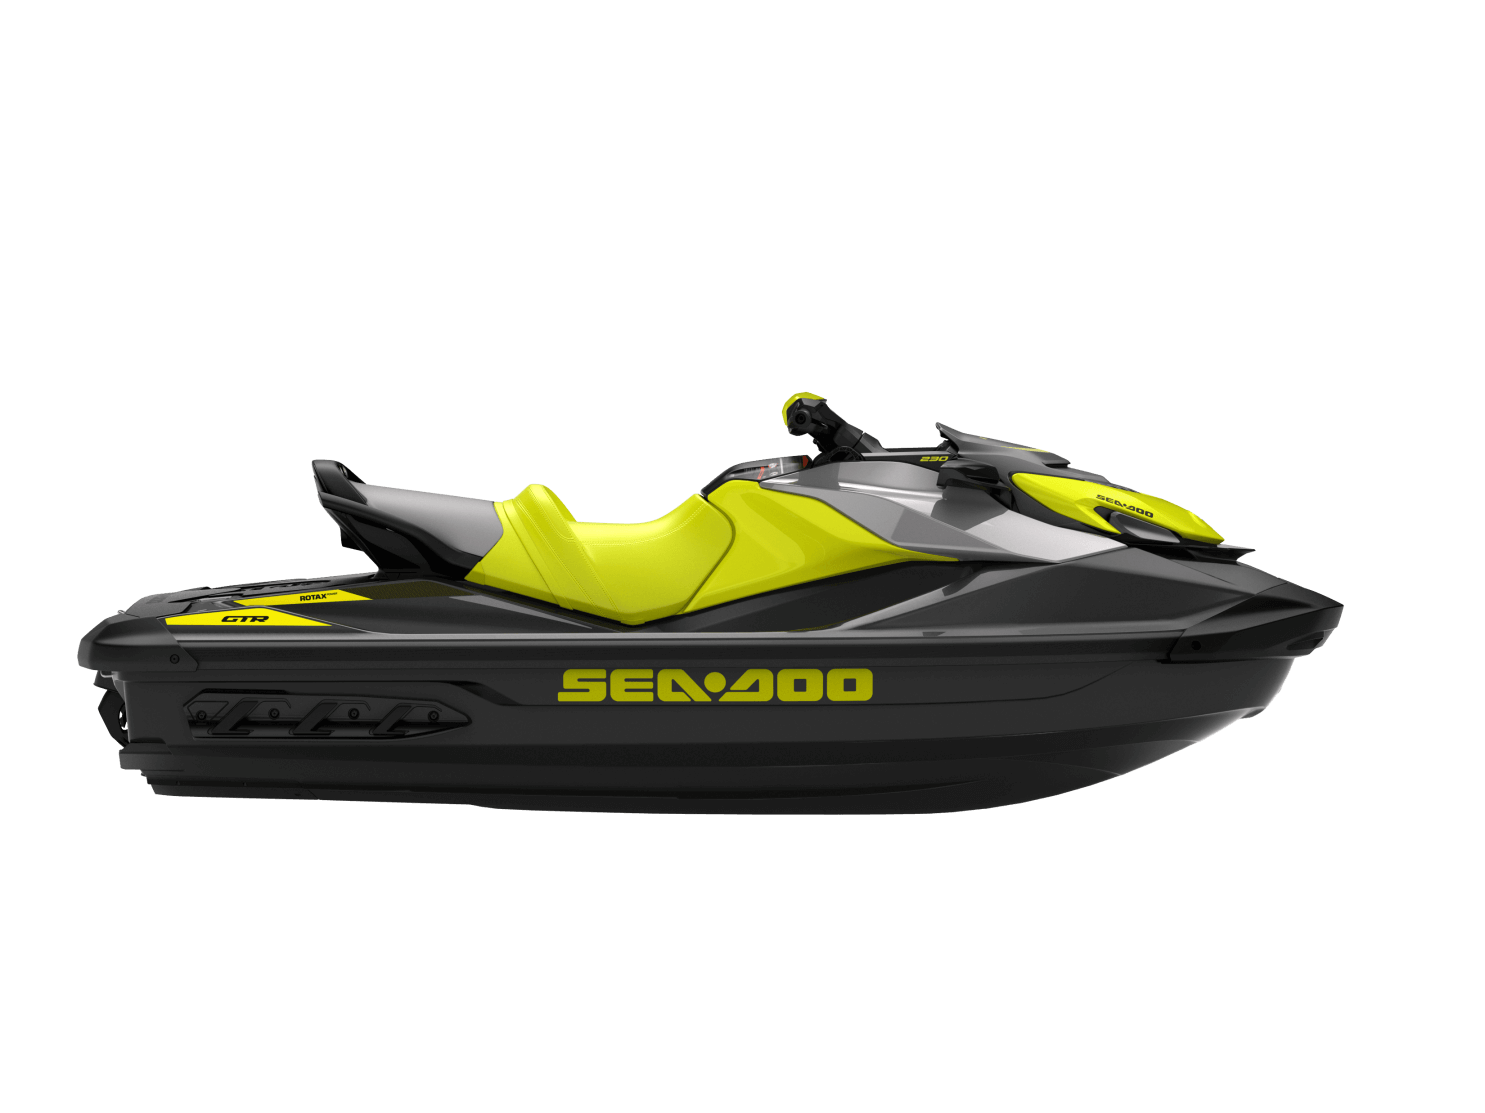 Southern Minnesota S 1 Atv Utv Marine Dealer Polaris Alumacraft Suzuki Ski Doo More La Canne S Marine Inc Faribault Mn 507 334 6415